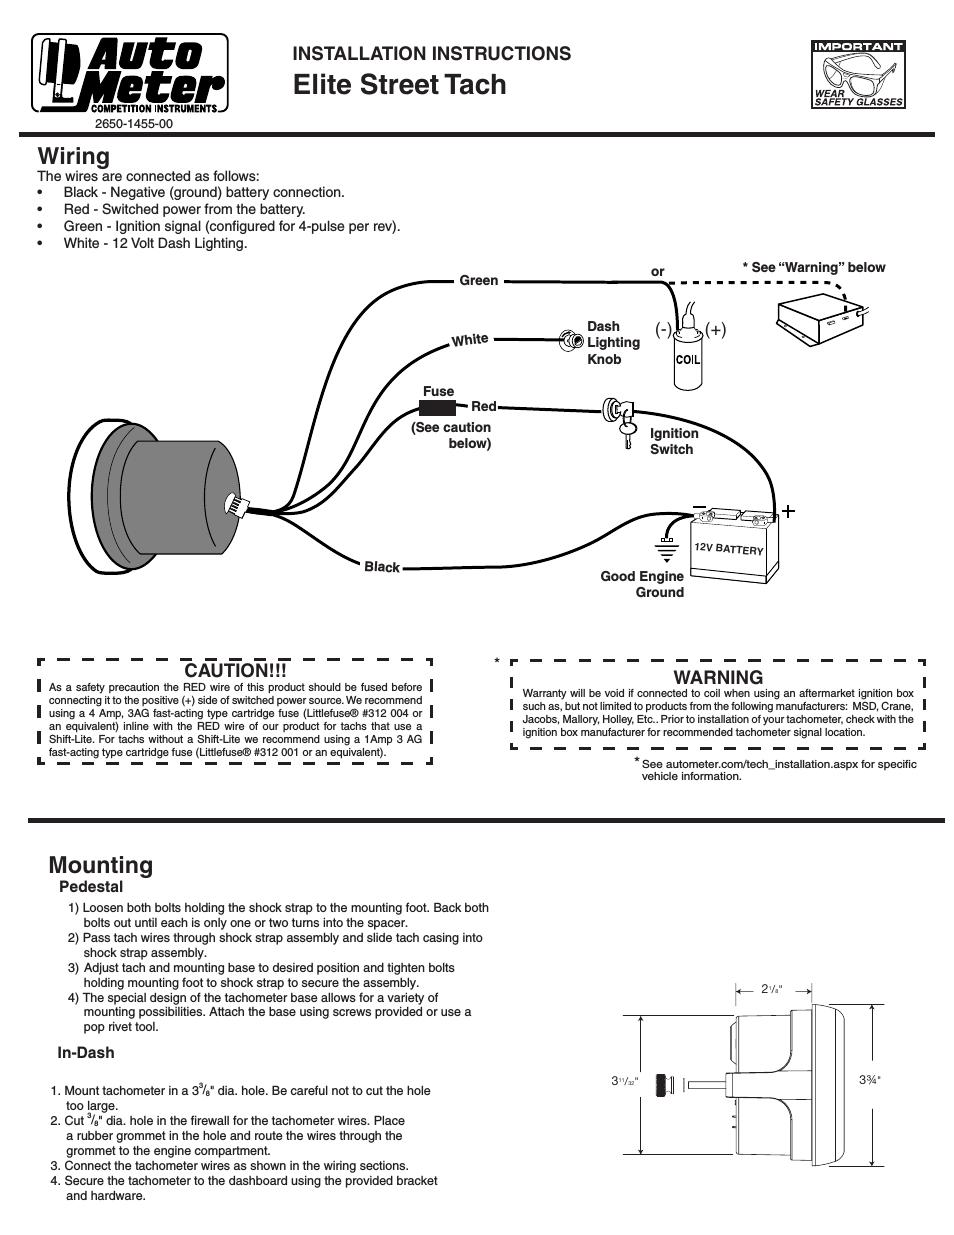 Sport Comp Tach Wiring Diagram - Home Ethernet Wiring Color -  fusebox.1997wir.jeanjaures37.fr | Sport Comp Tach Wiring Diagram |  | Wiring Diagram Resource